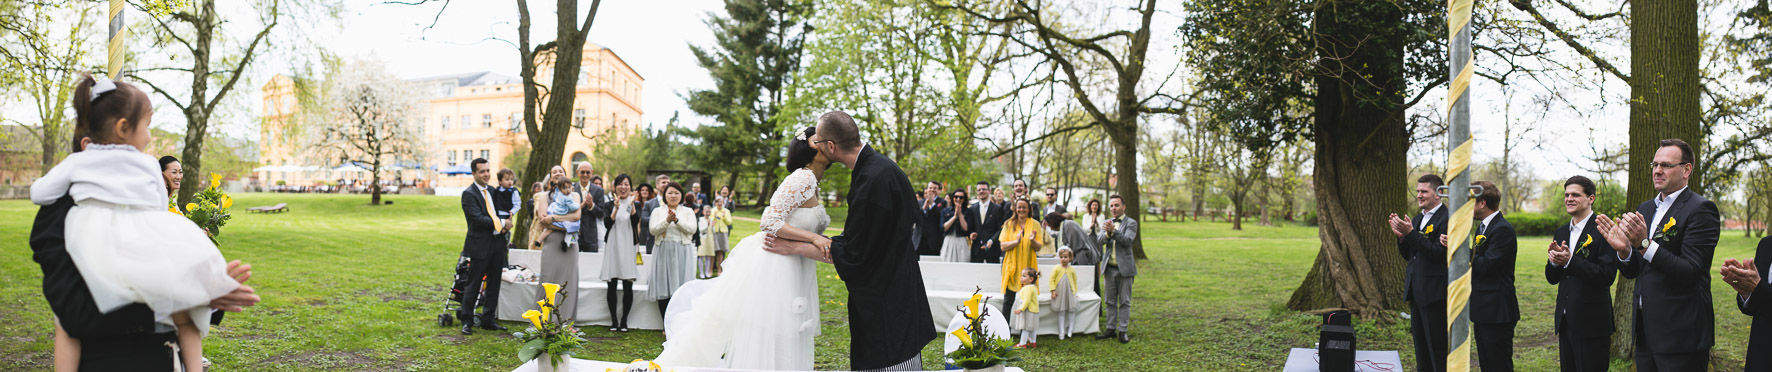 Hochzeit-Patzwaldt-200-10x15cm